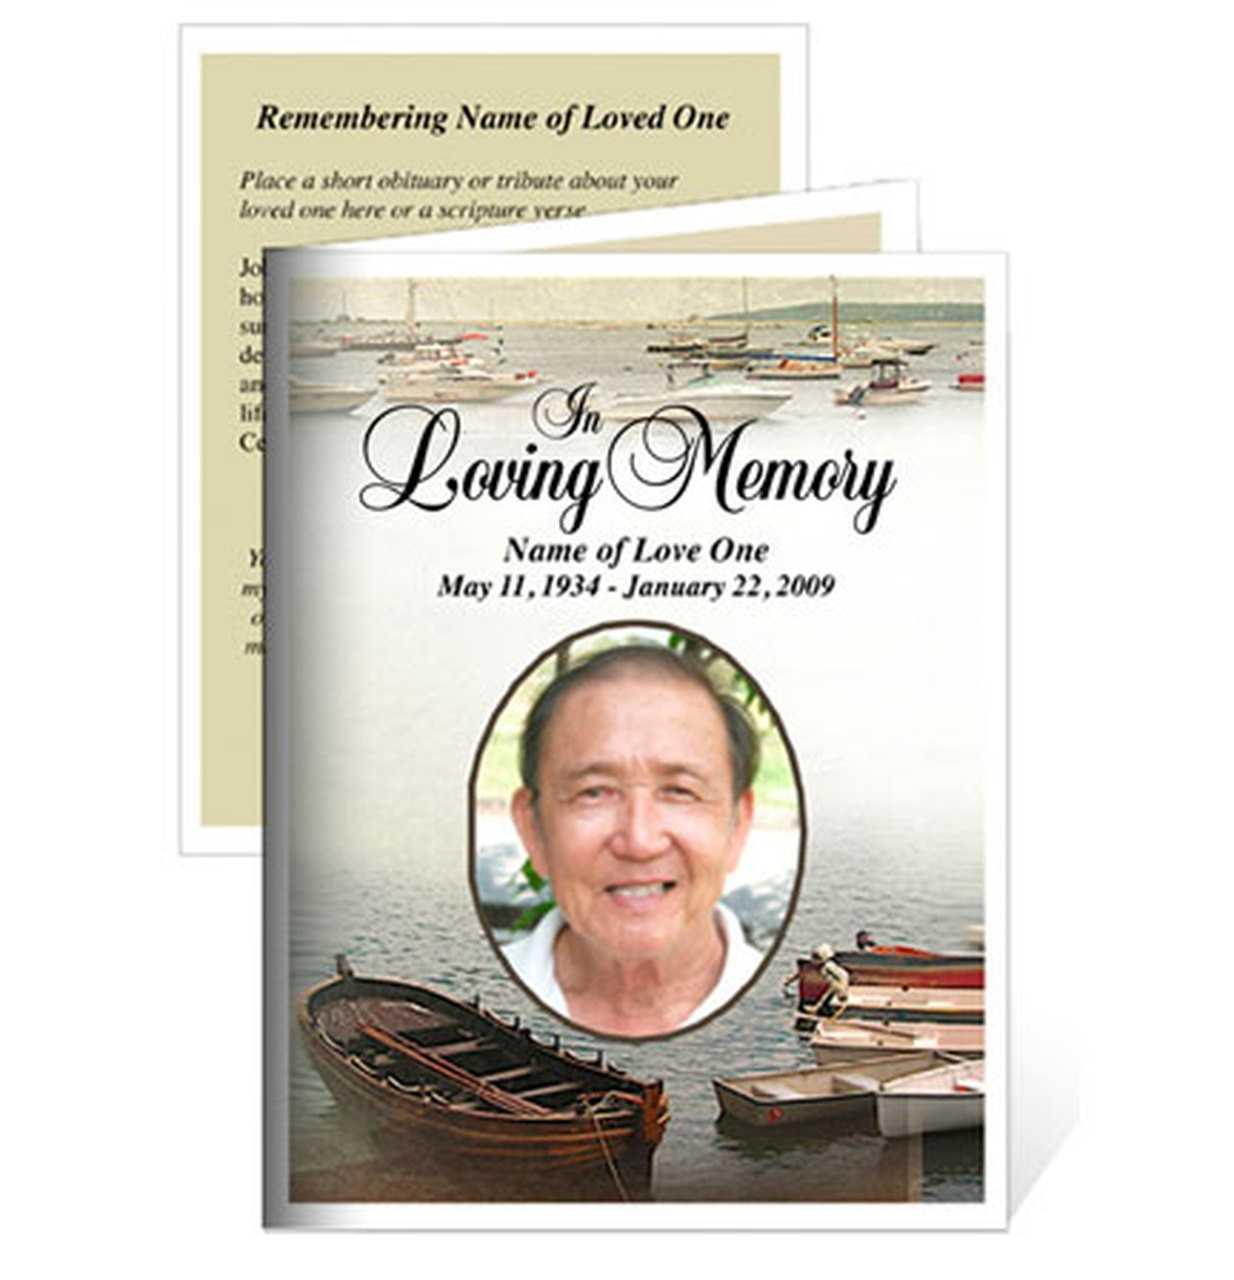 Template For Memorial Card - Karan.ald2014 Pertaining To Memorial Cards For Funeral Template Free